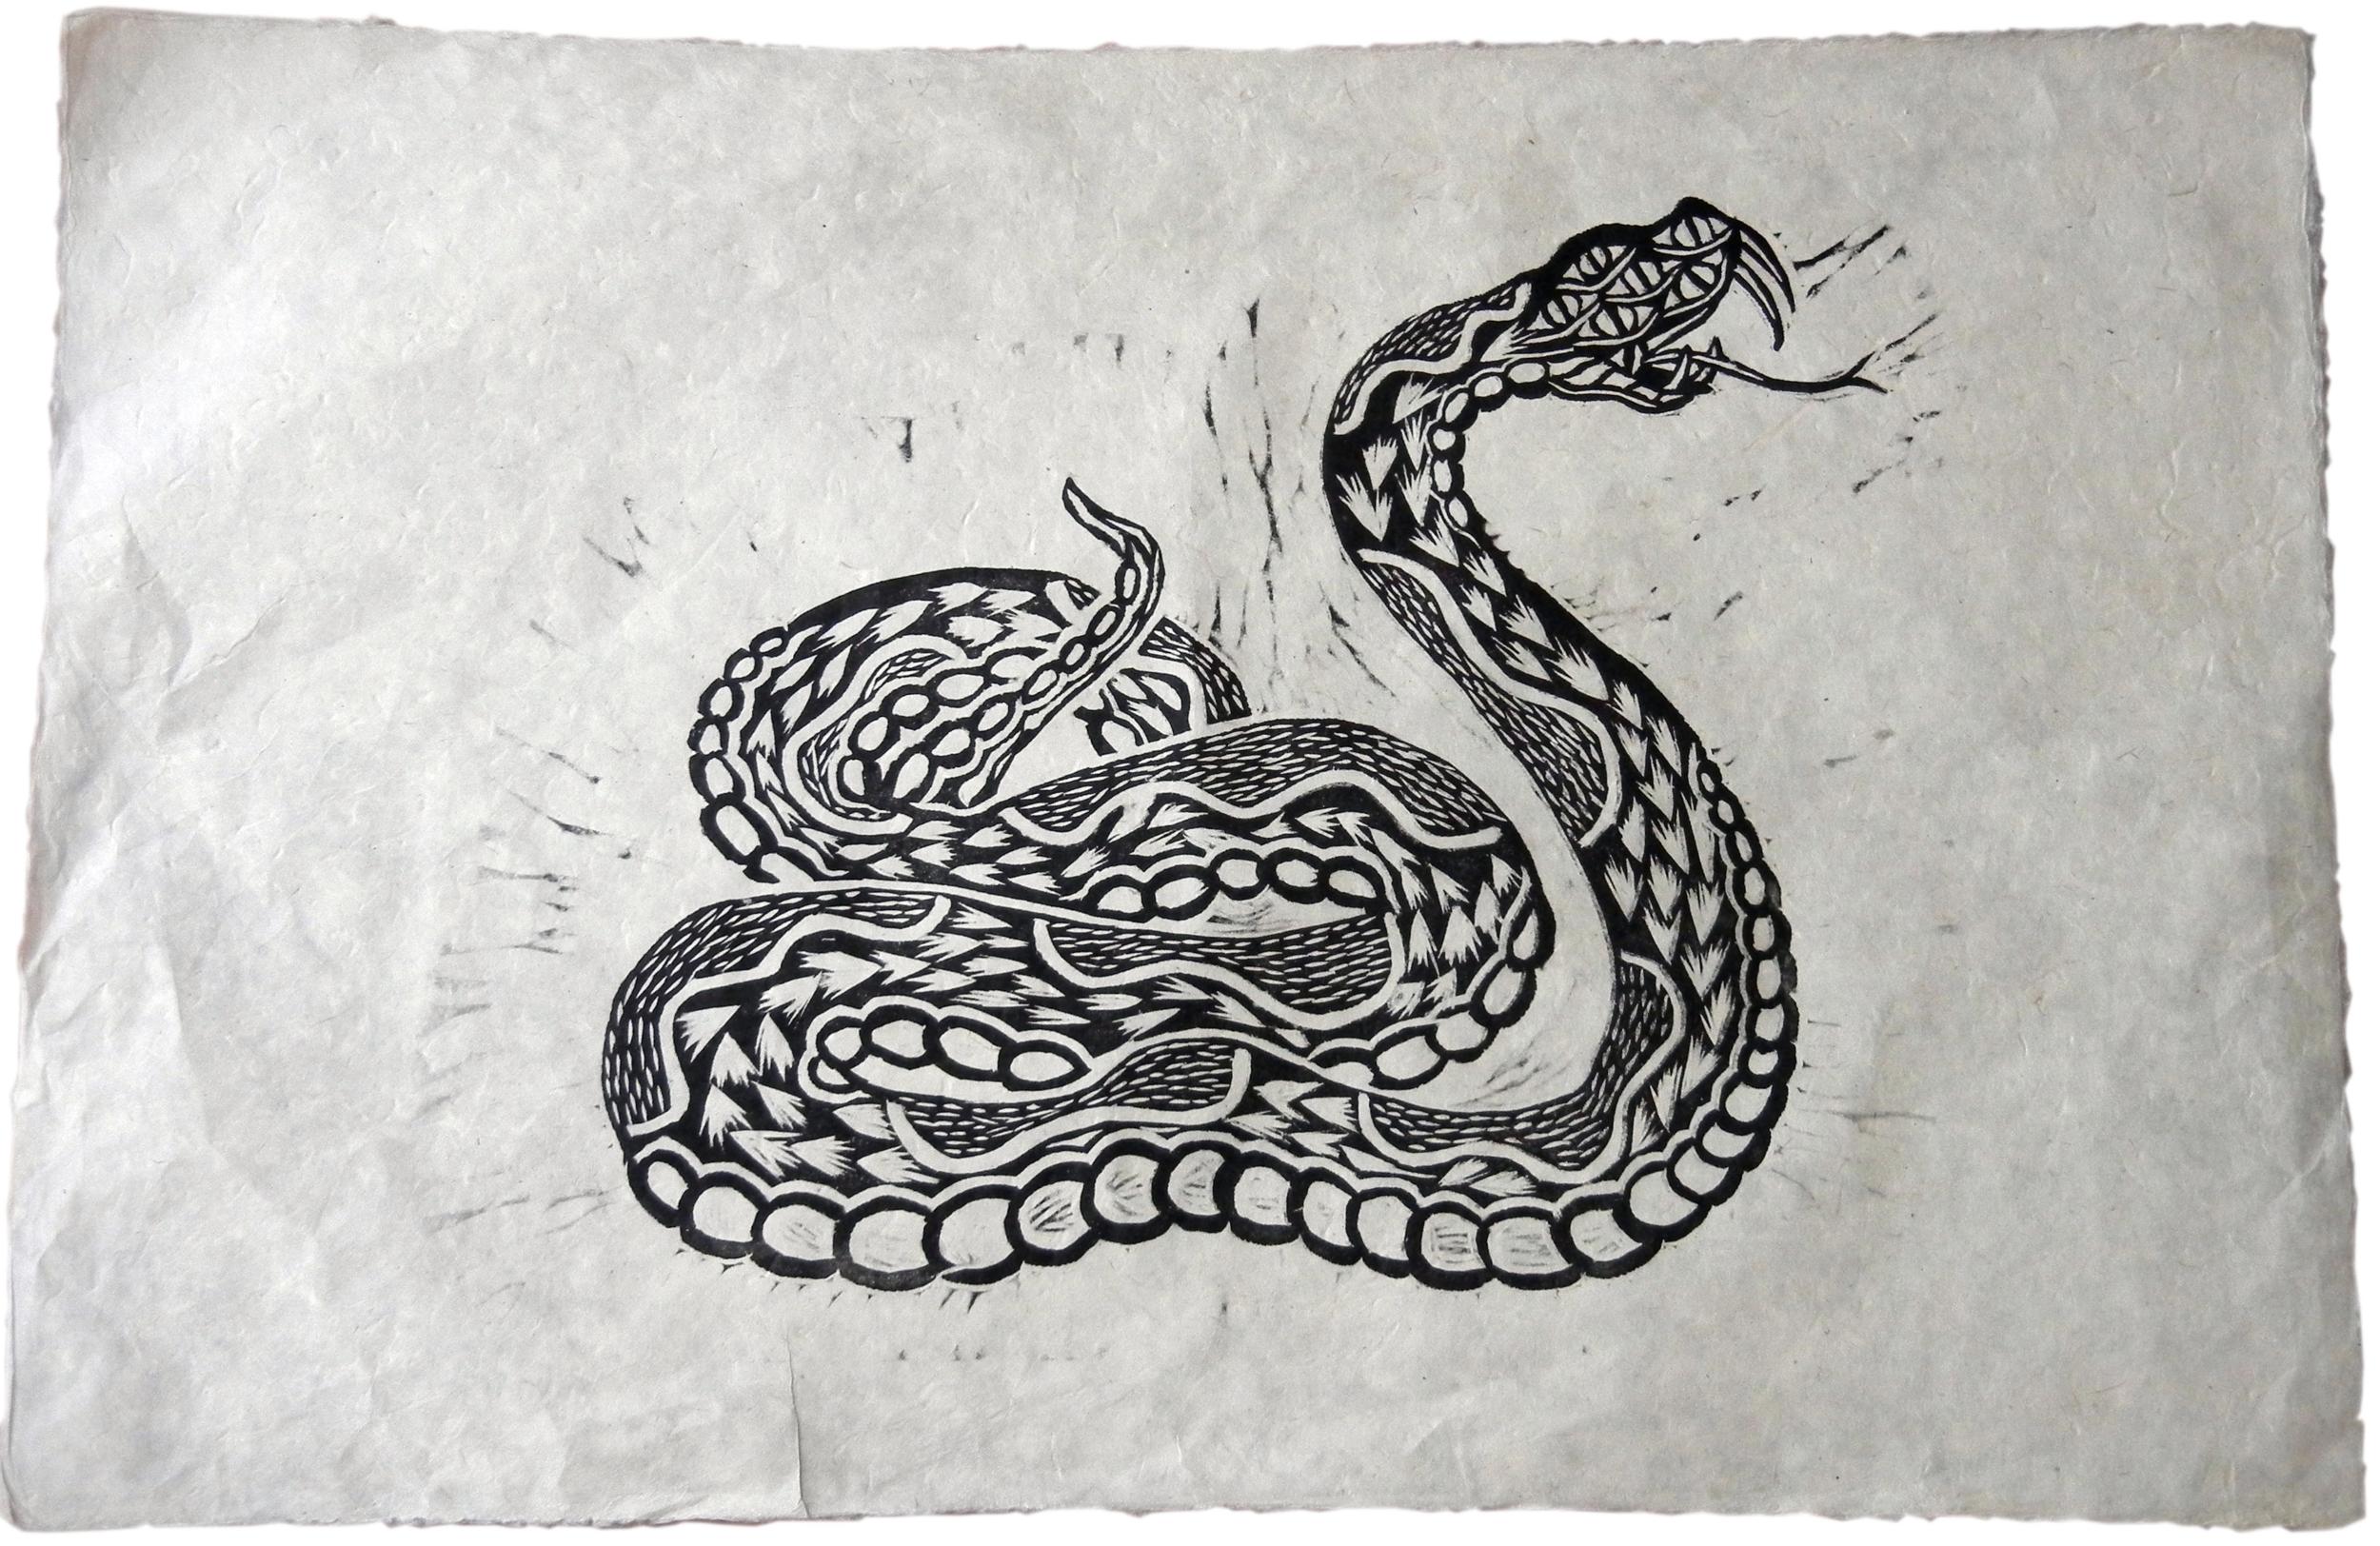 Jake Cassevoy Untitled #1 Woodblock print $100.